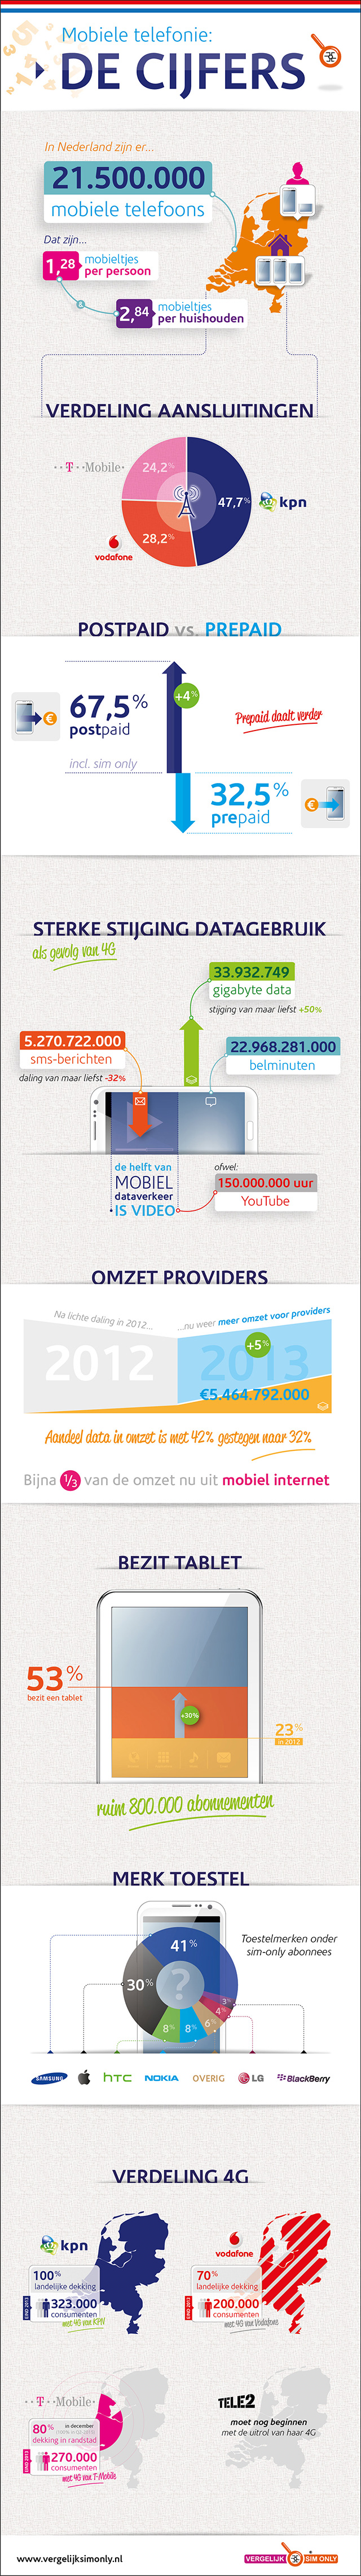 infographic-2014.Nederland.Mobielgebruik